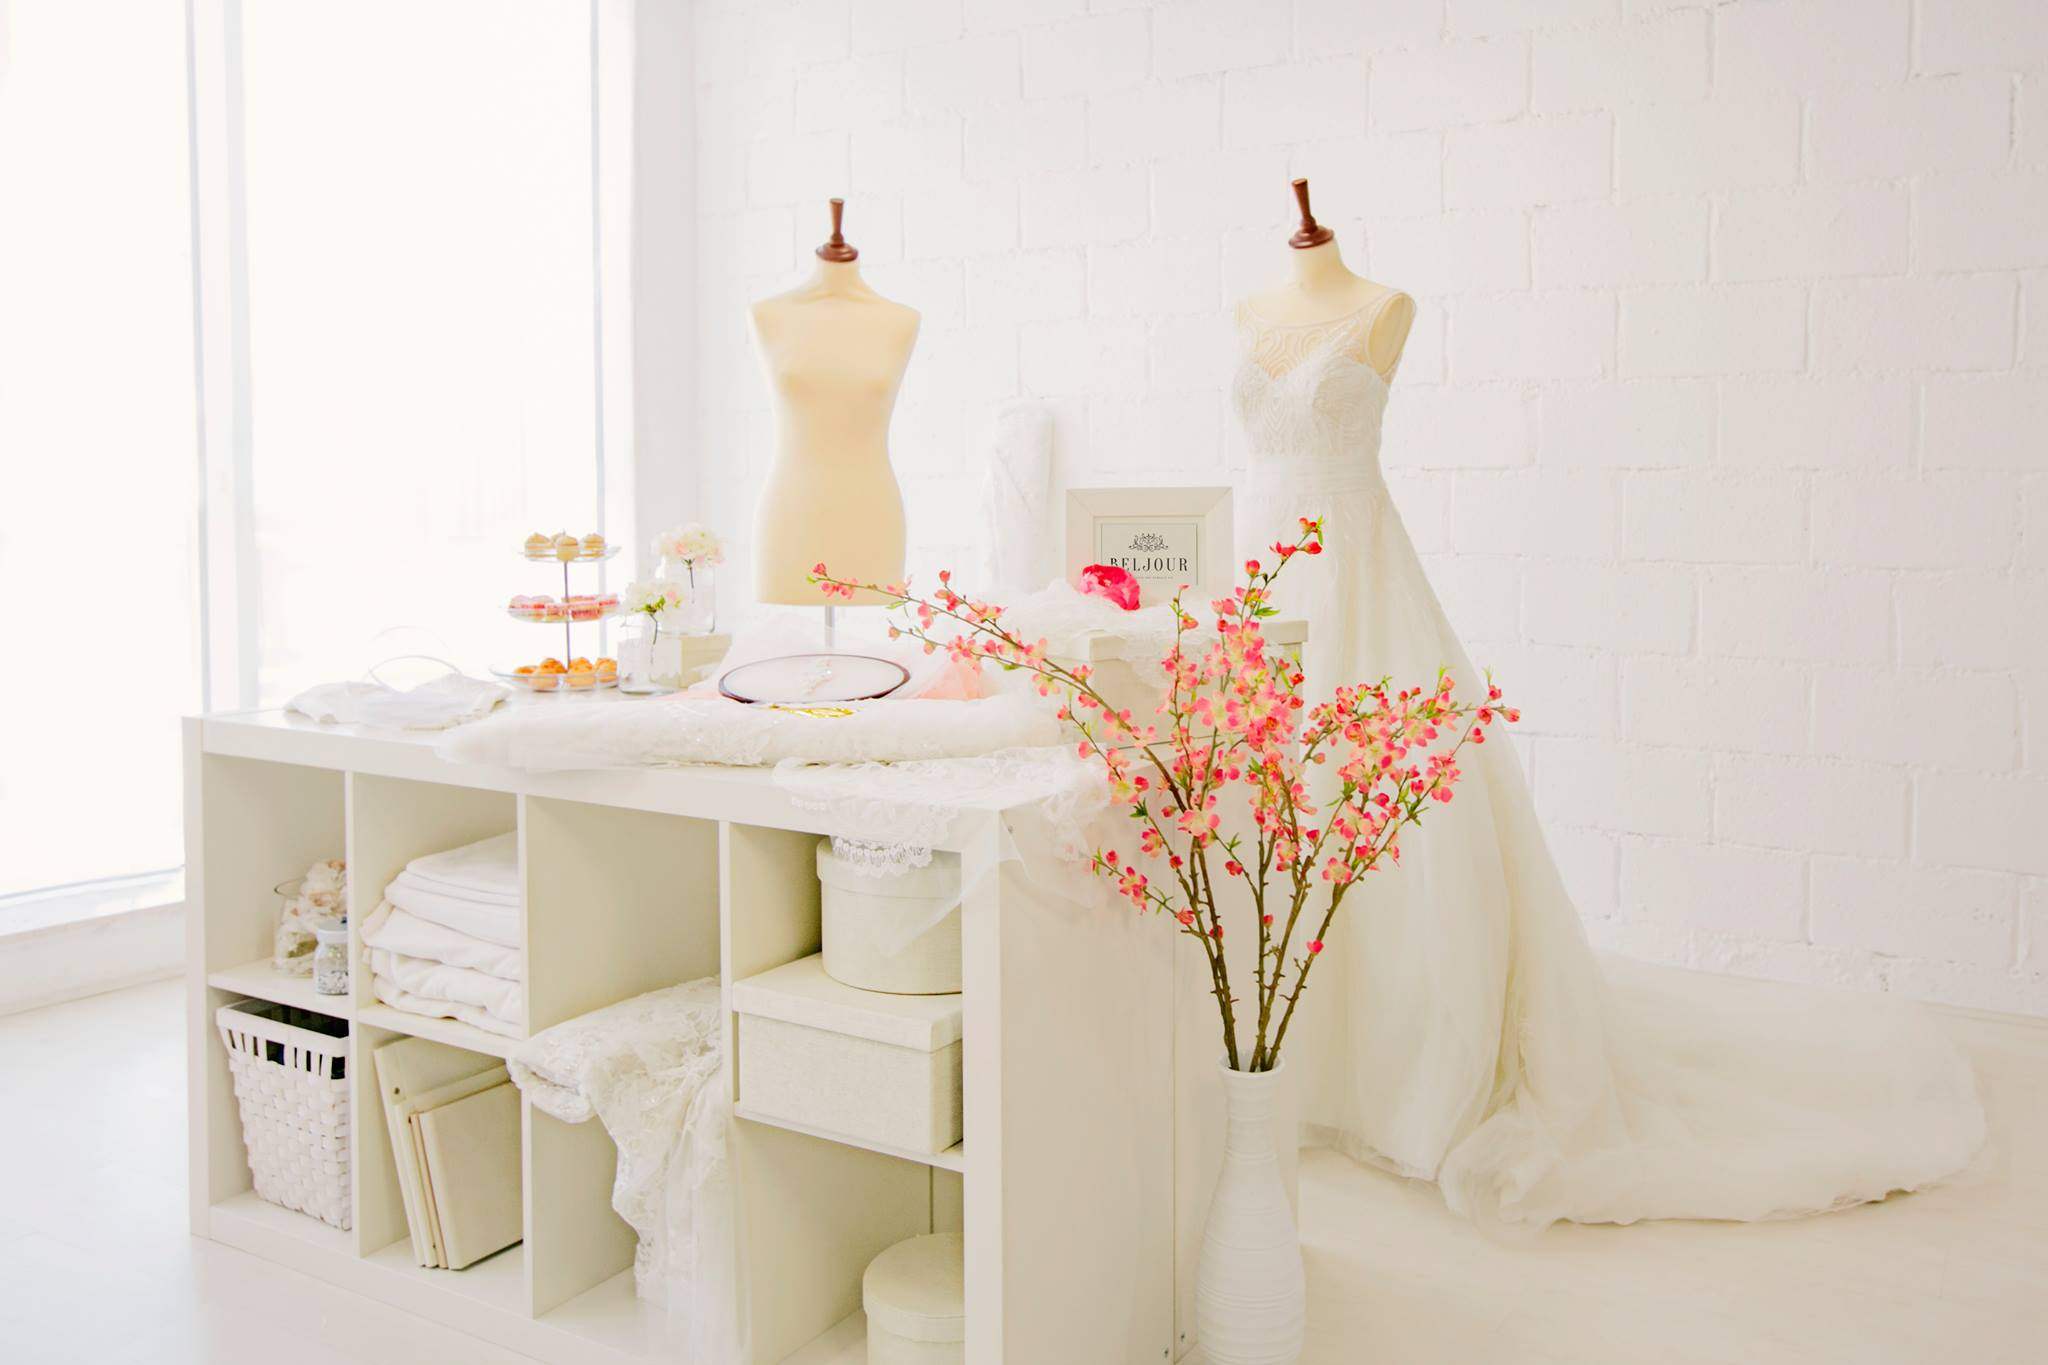 52a8d837ef3e6 أشهر 9 محلات فساتين اعراس في دبي